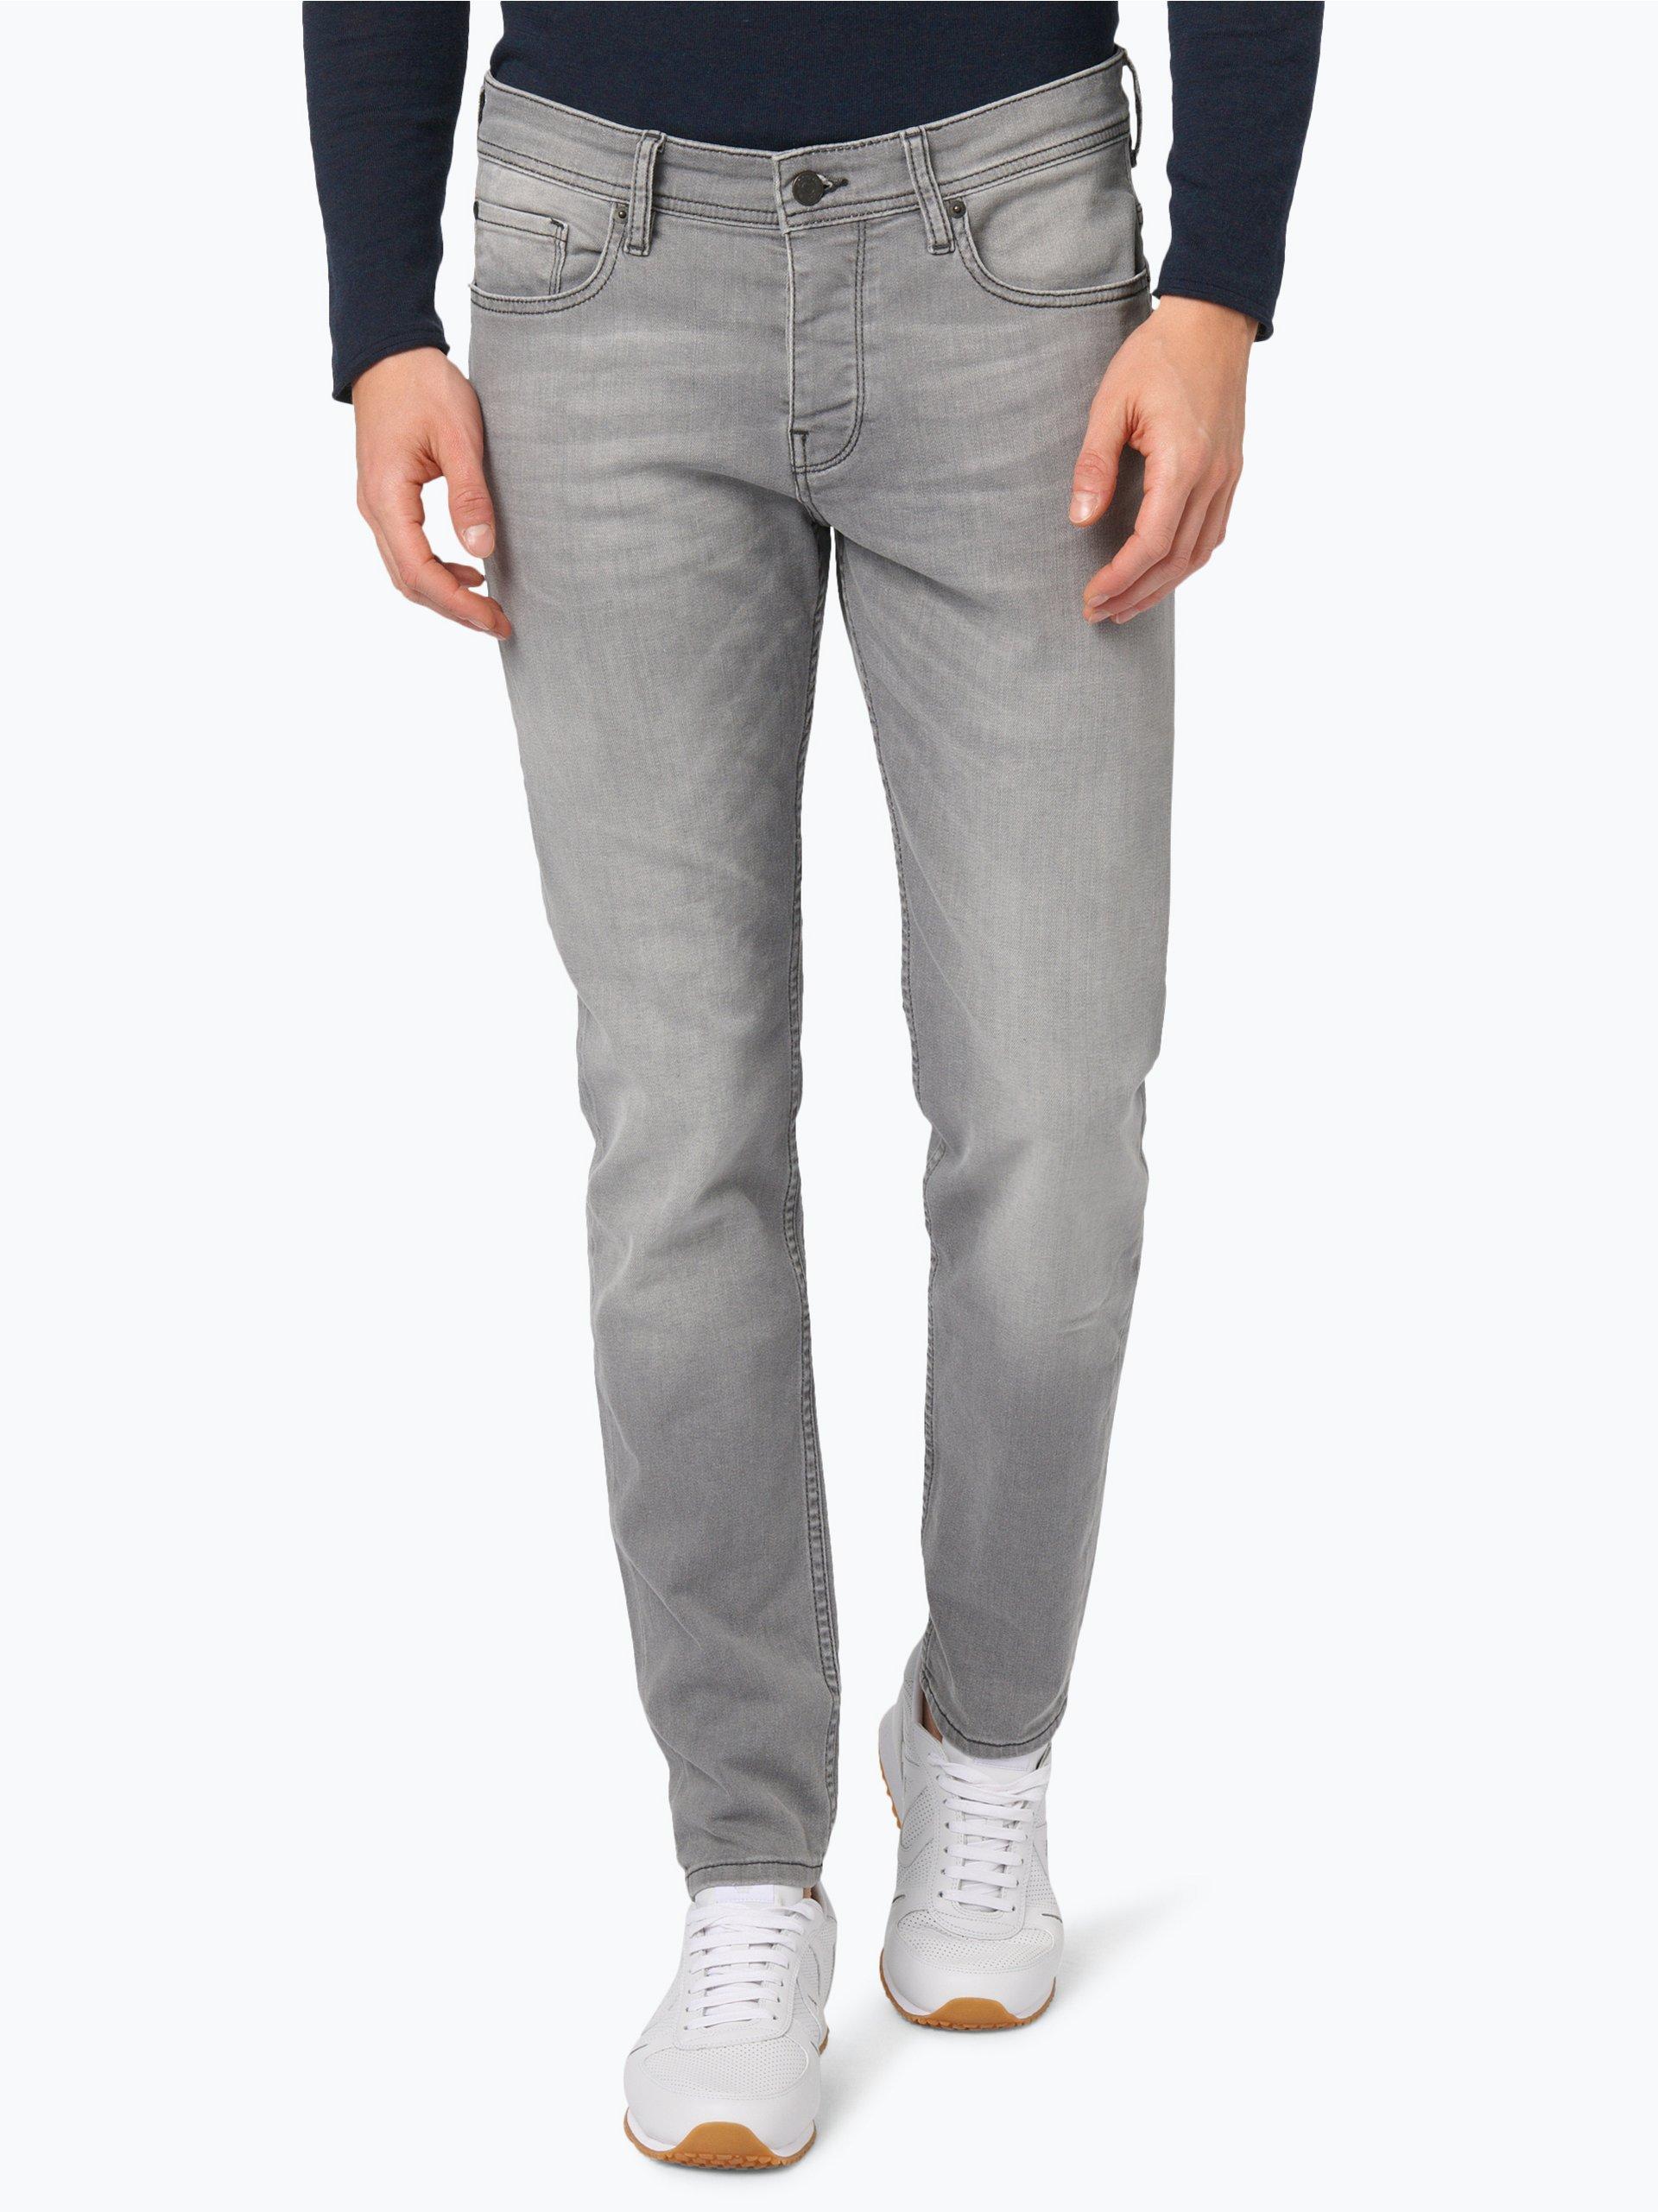 boss casual herren jeans orange 90 grau uni online kaufen peek und cloppenburg de. Black Bedroom Furniture Sets. Home Design Ideas